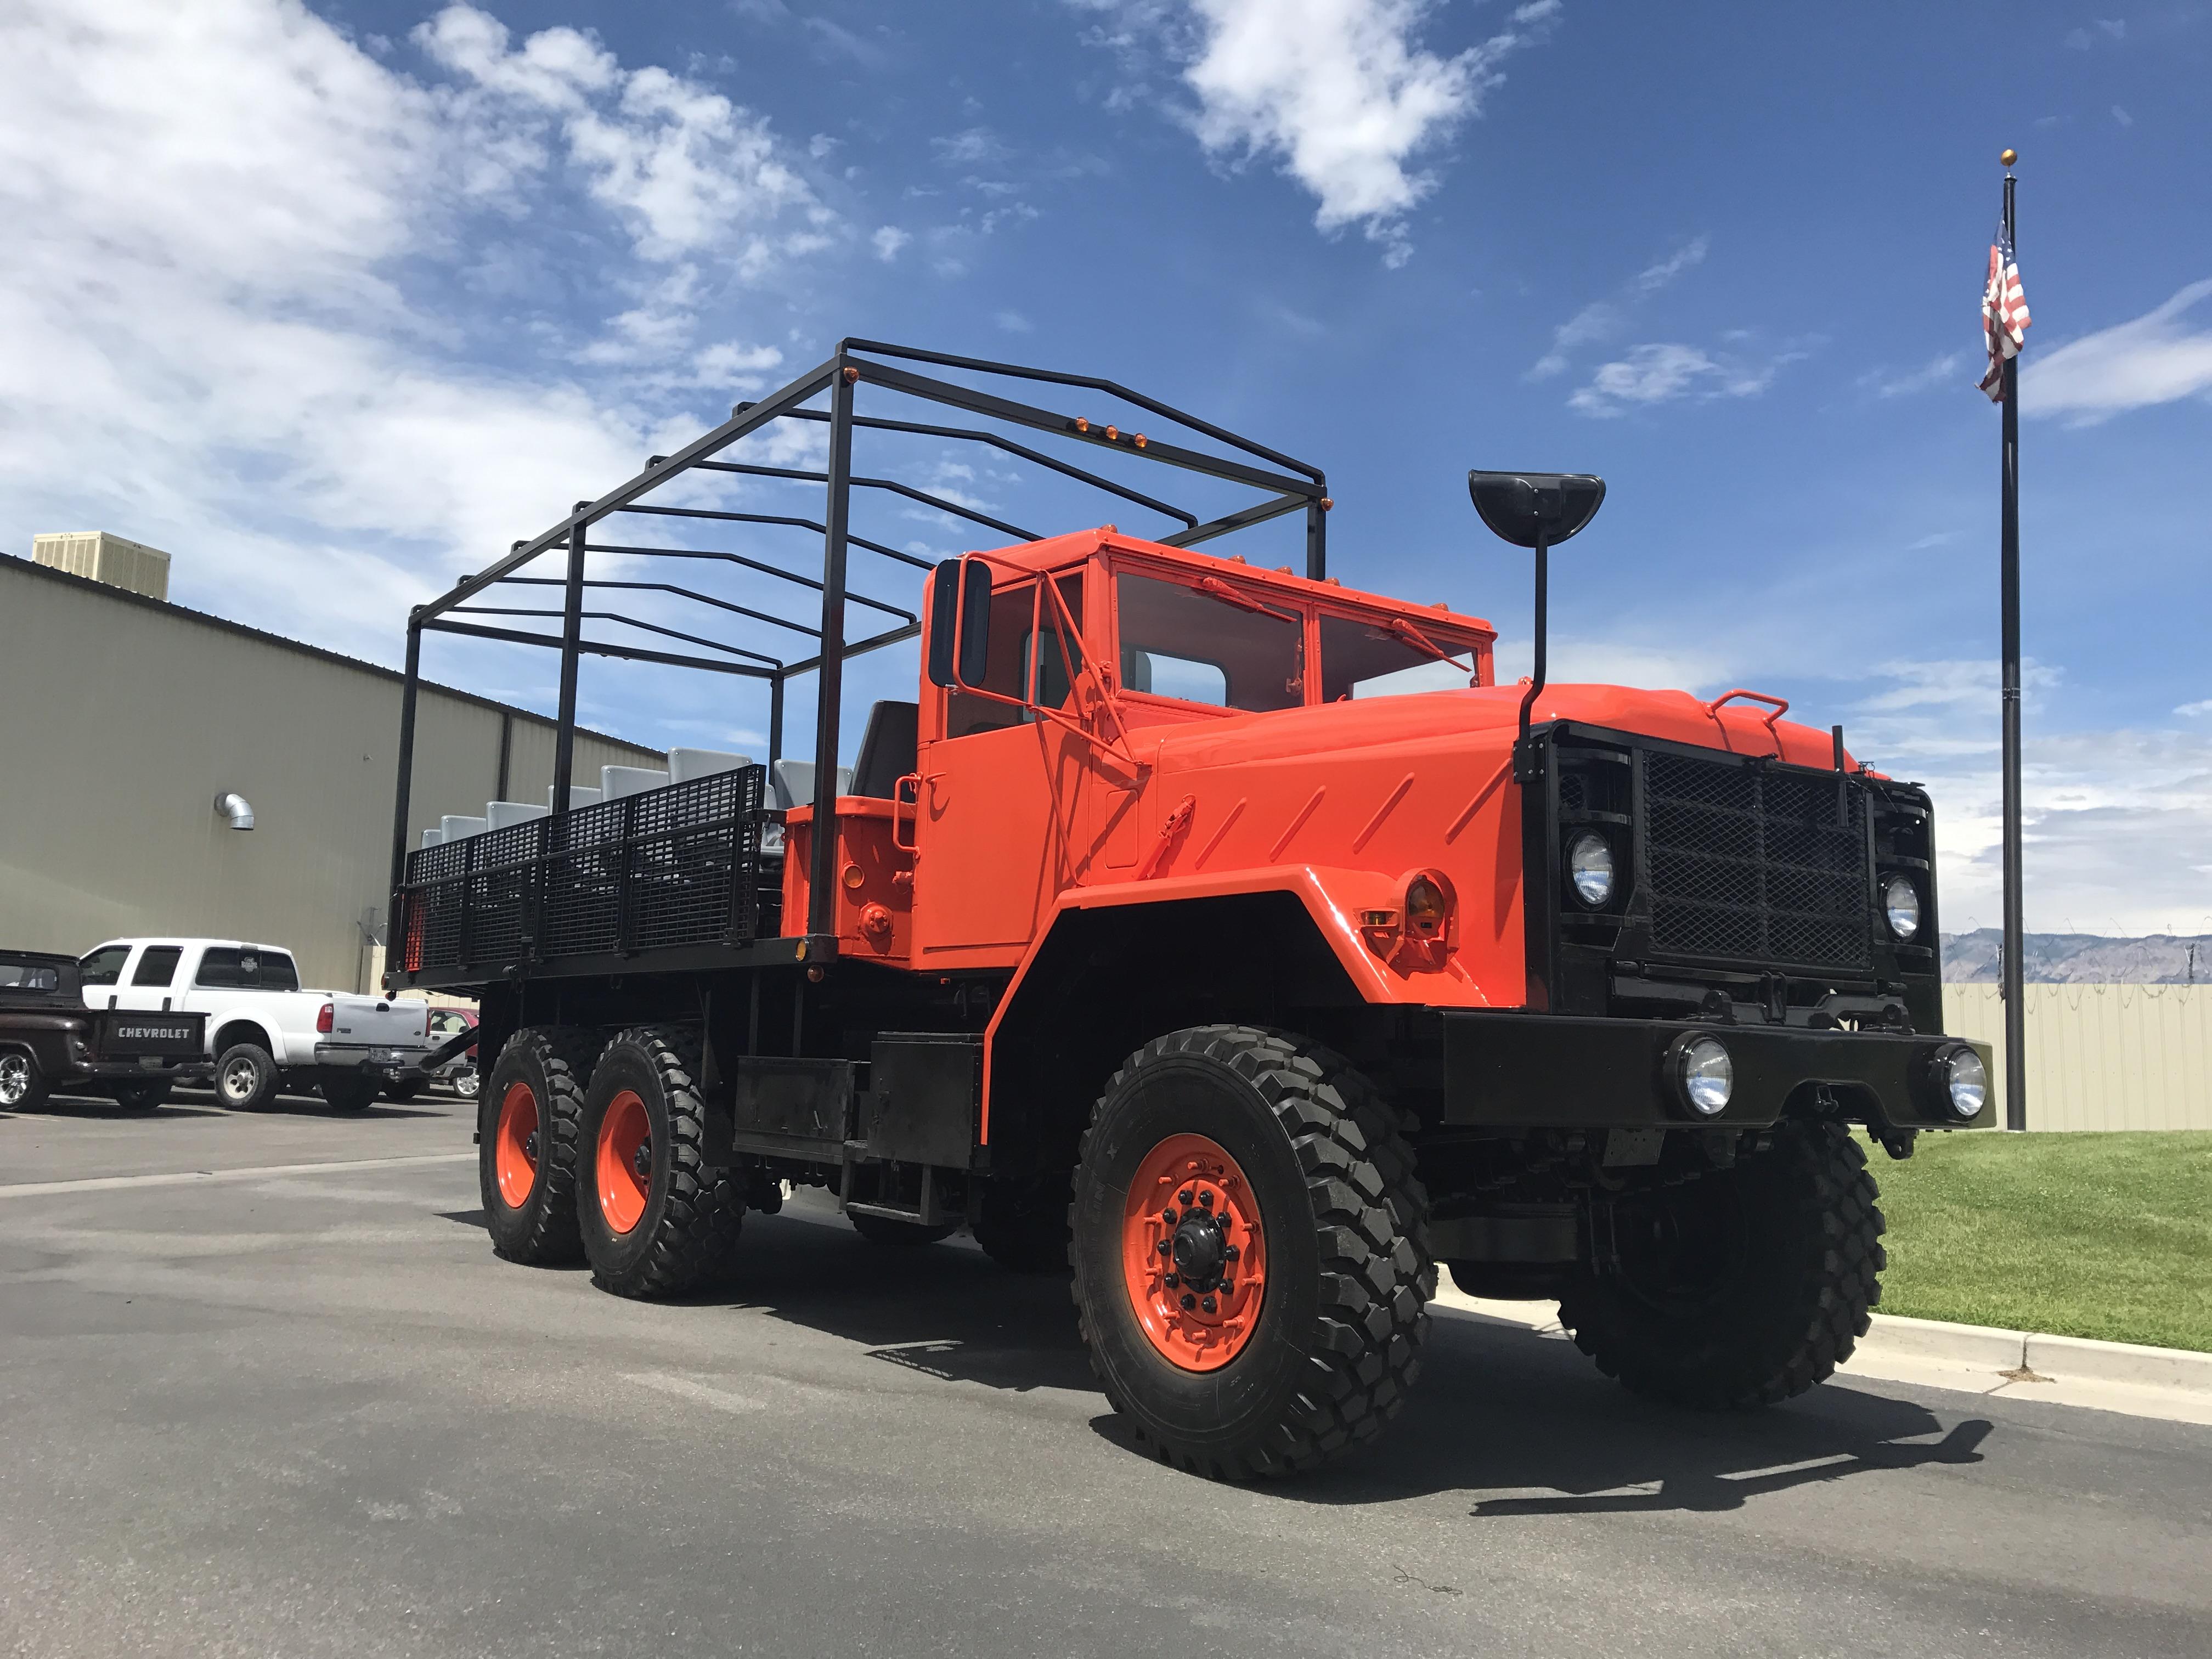 M923A2 900 Series 5 Ton 6x6- Shipped- Glenwood Springs, CO